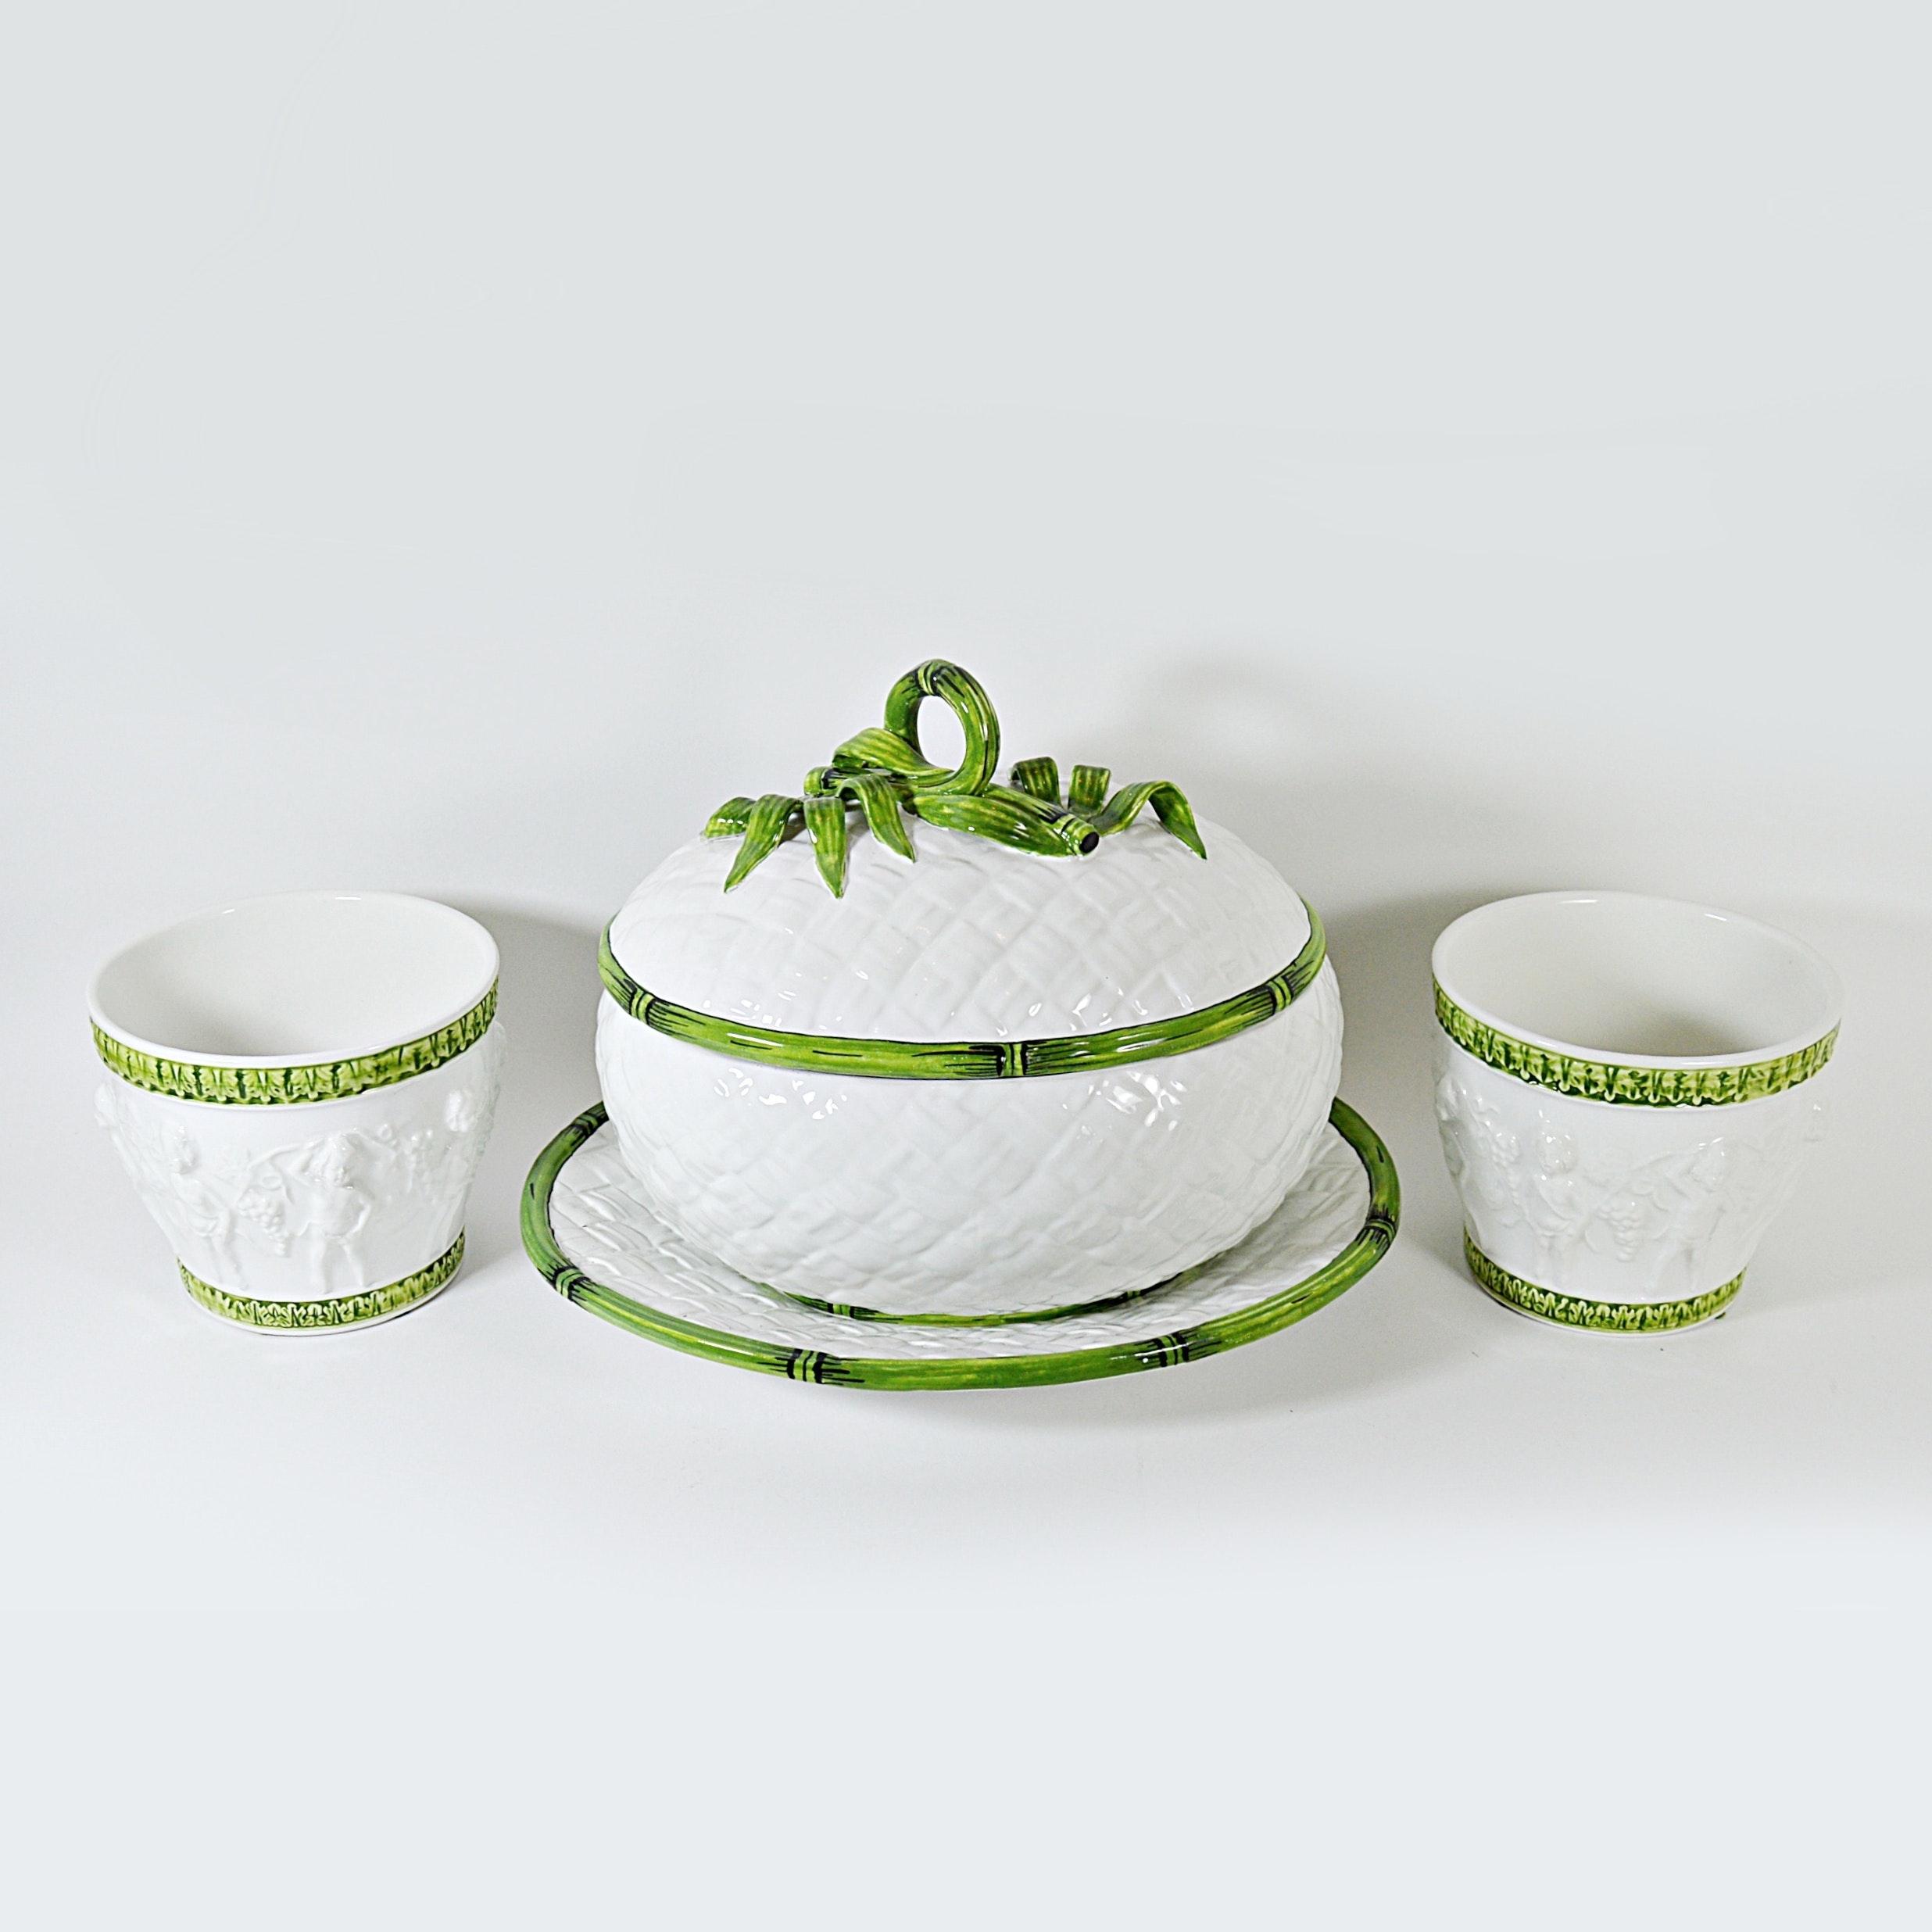 Italian Ceramic Tureen and Two Cache Pots